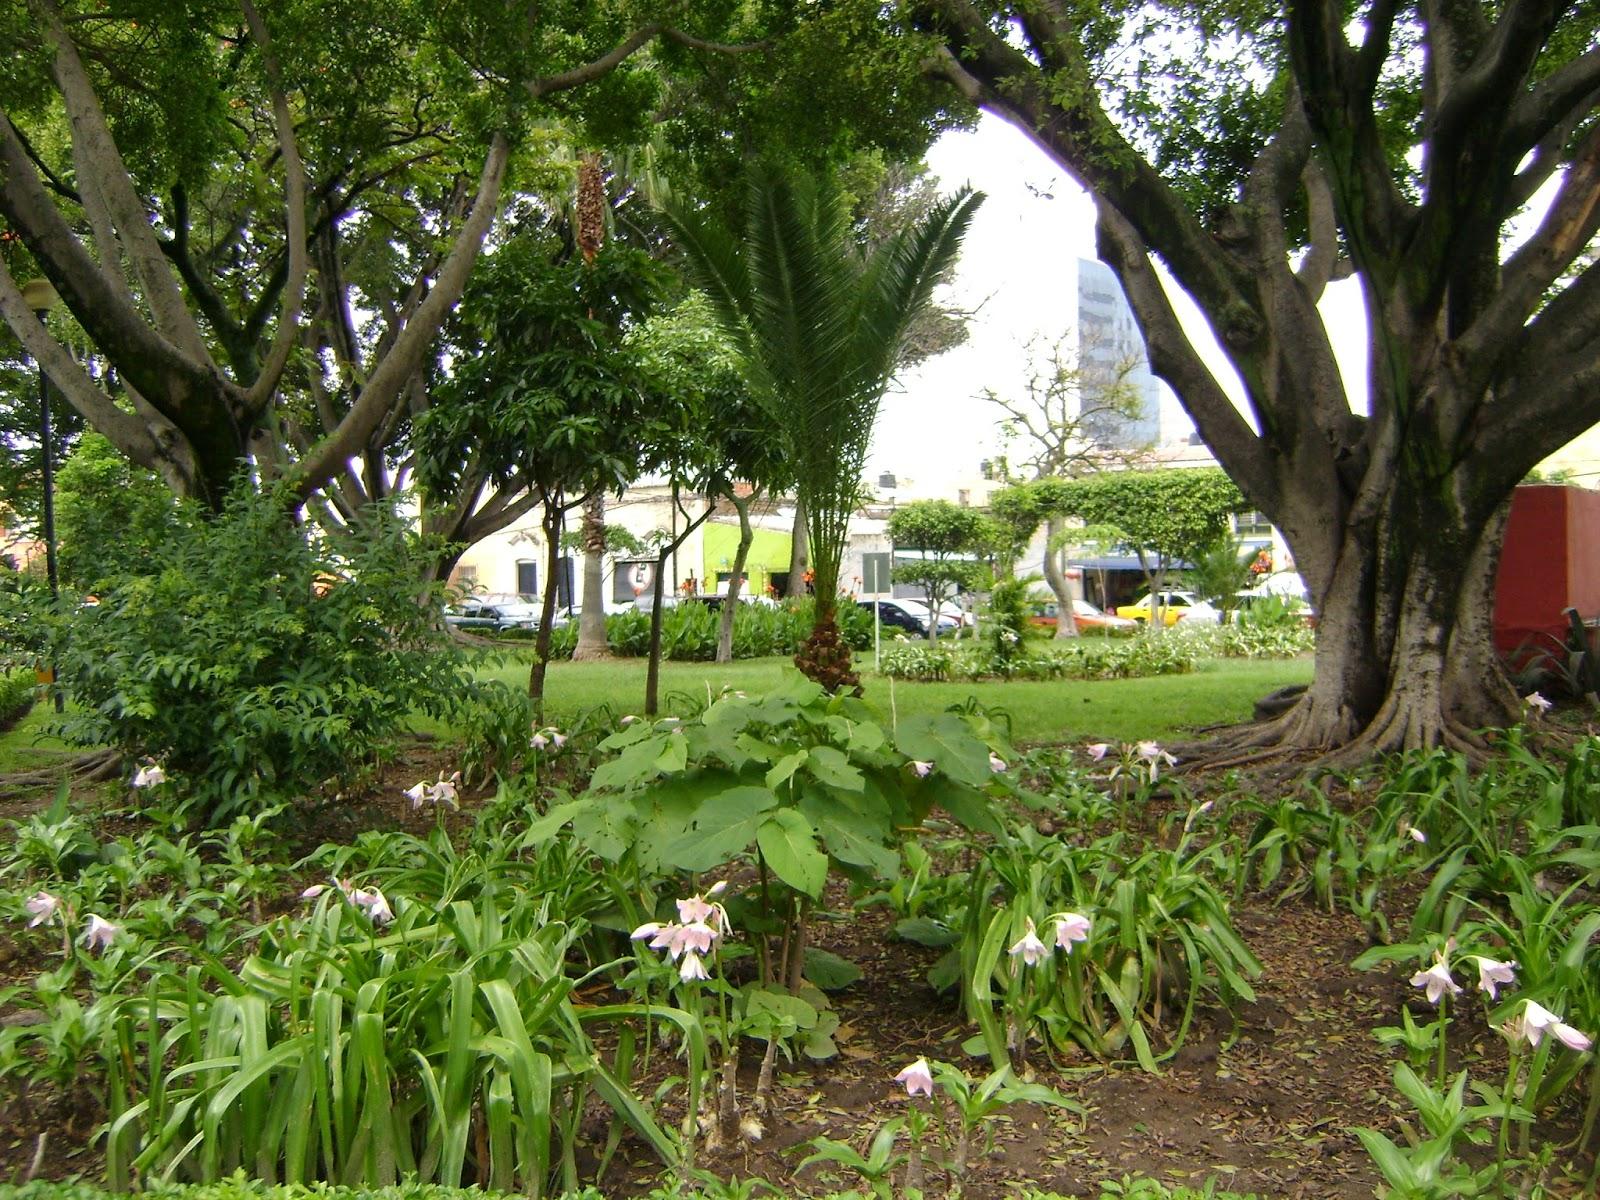 Sancarlosfortin agosto 2014 for Jardin botanico xmuch haltun